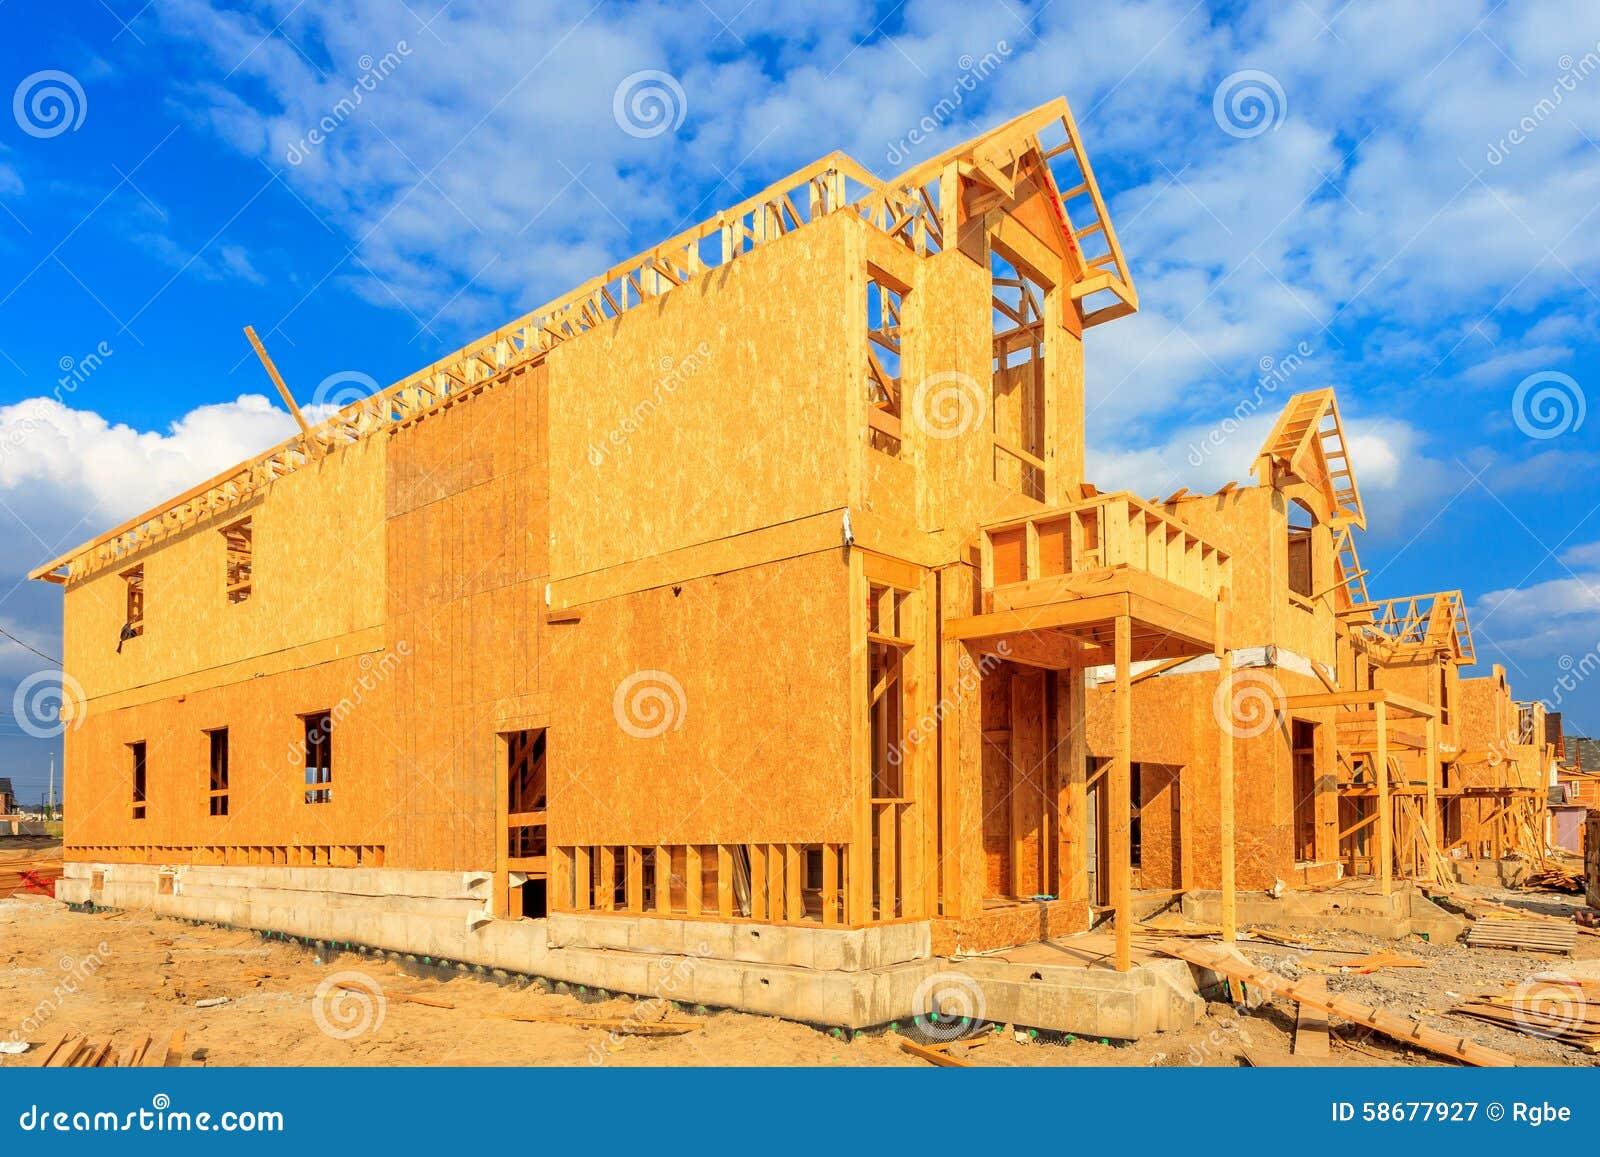 House Construction Stock Photo Image 58677927